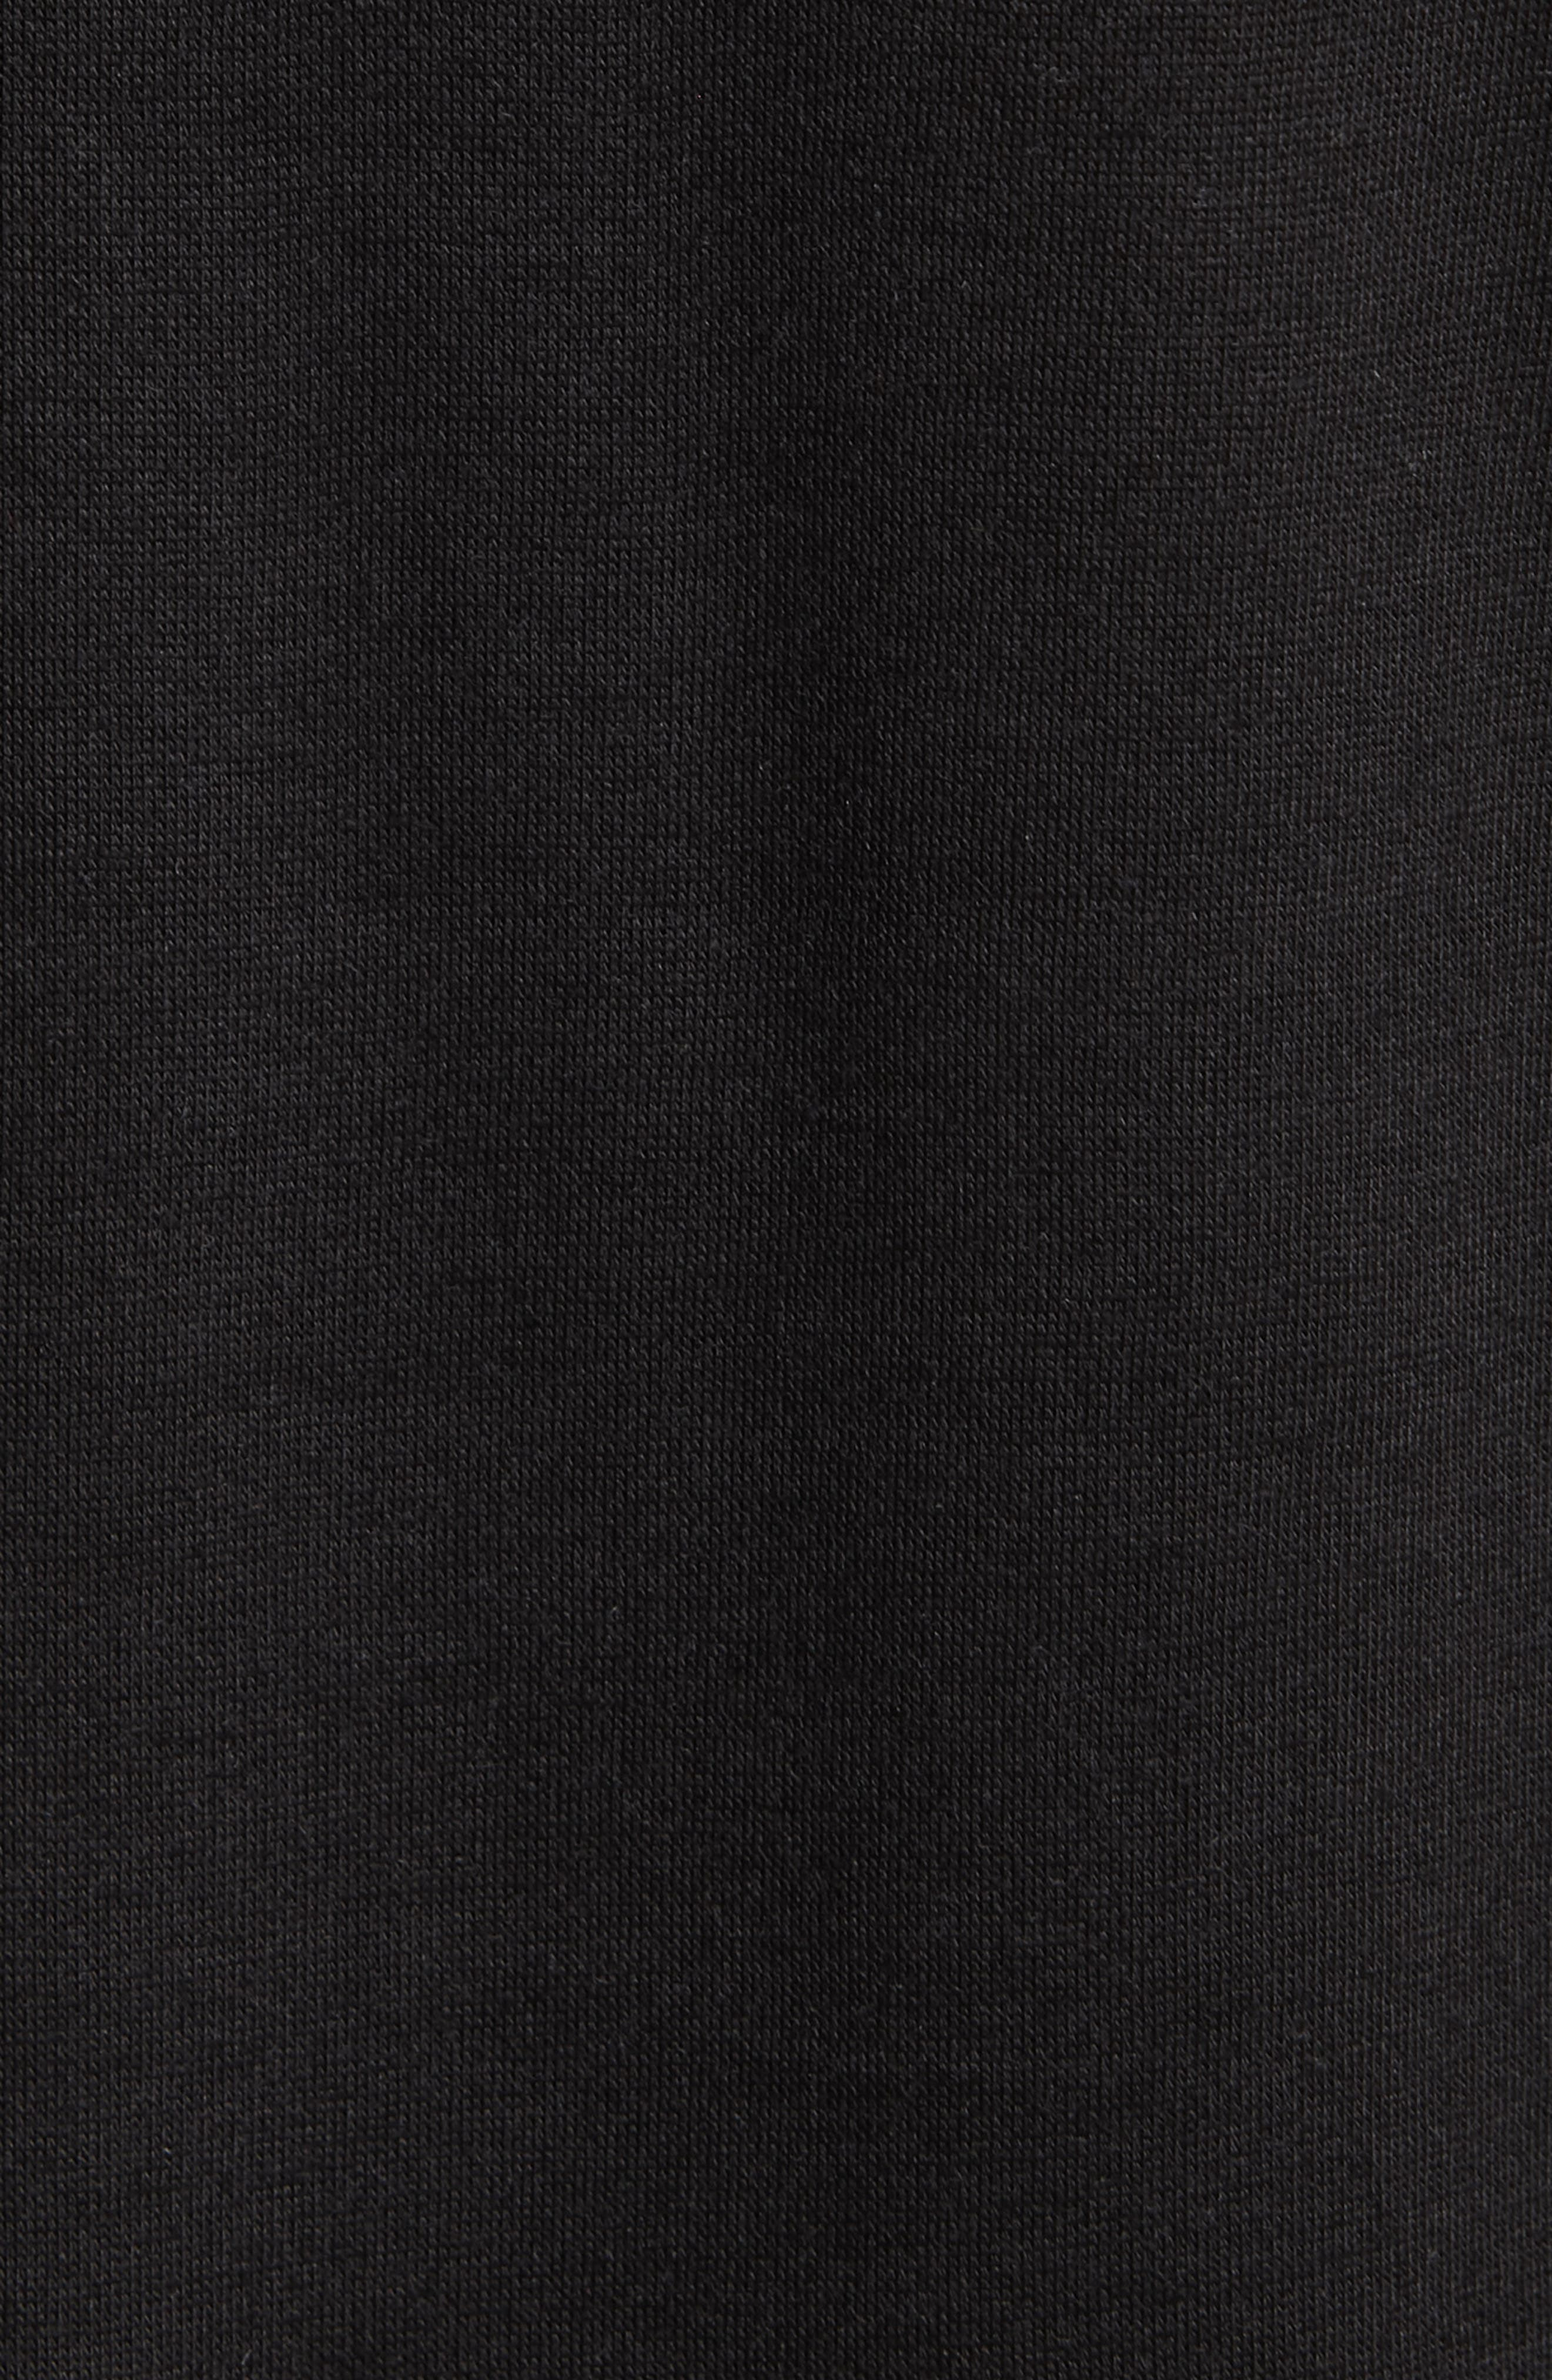 Daneli Narnia Ruffle Sleeve Top,                             Alternate thumbnail 5, color,                             BLACK